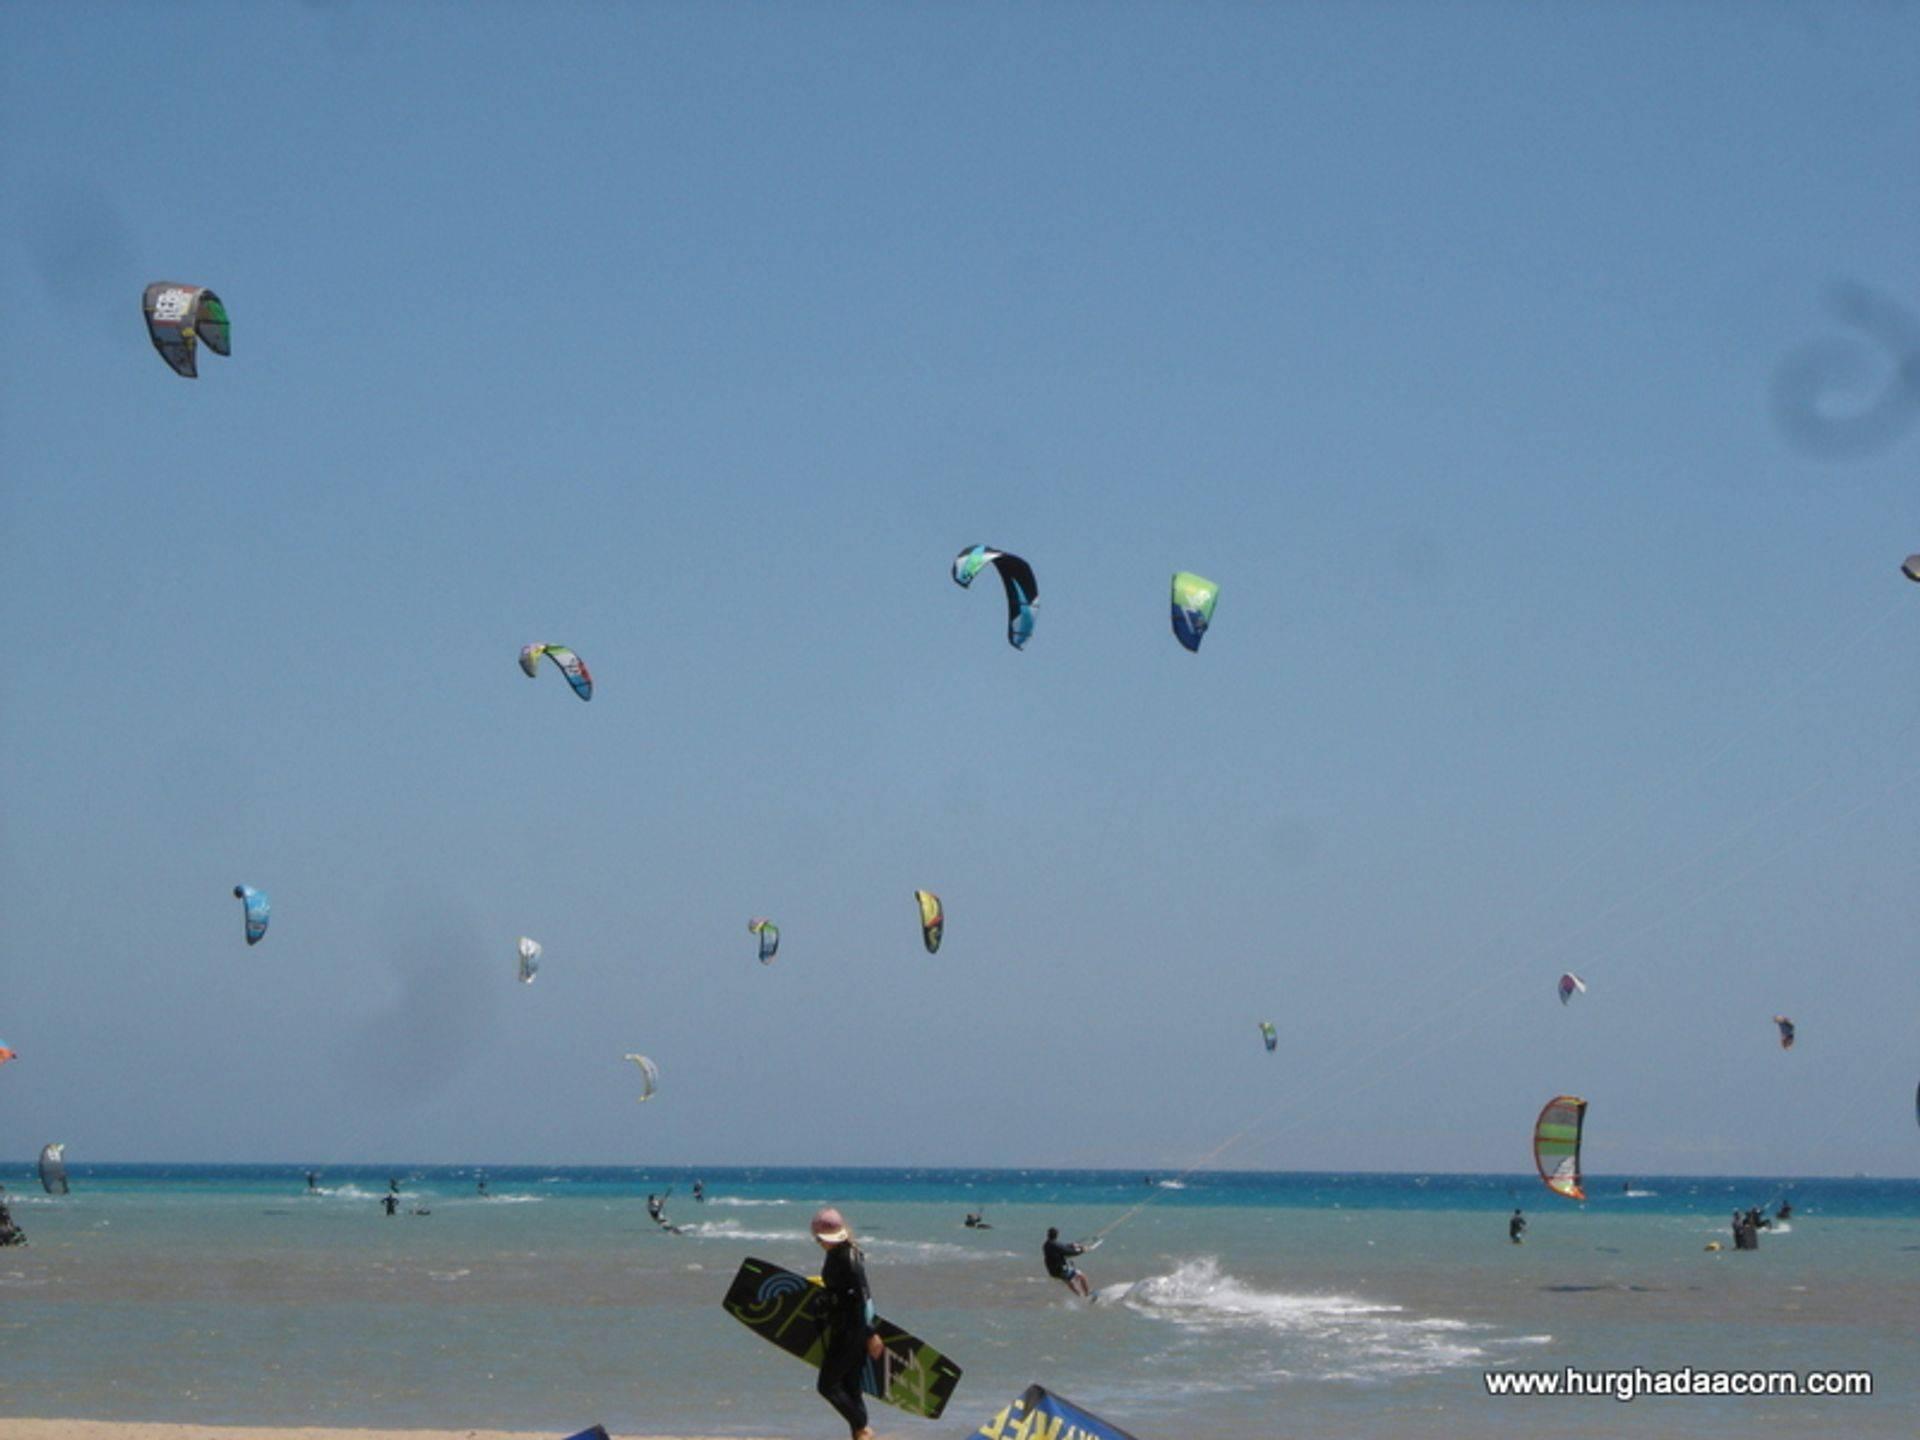 Kite Surfing in Hurghada